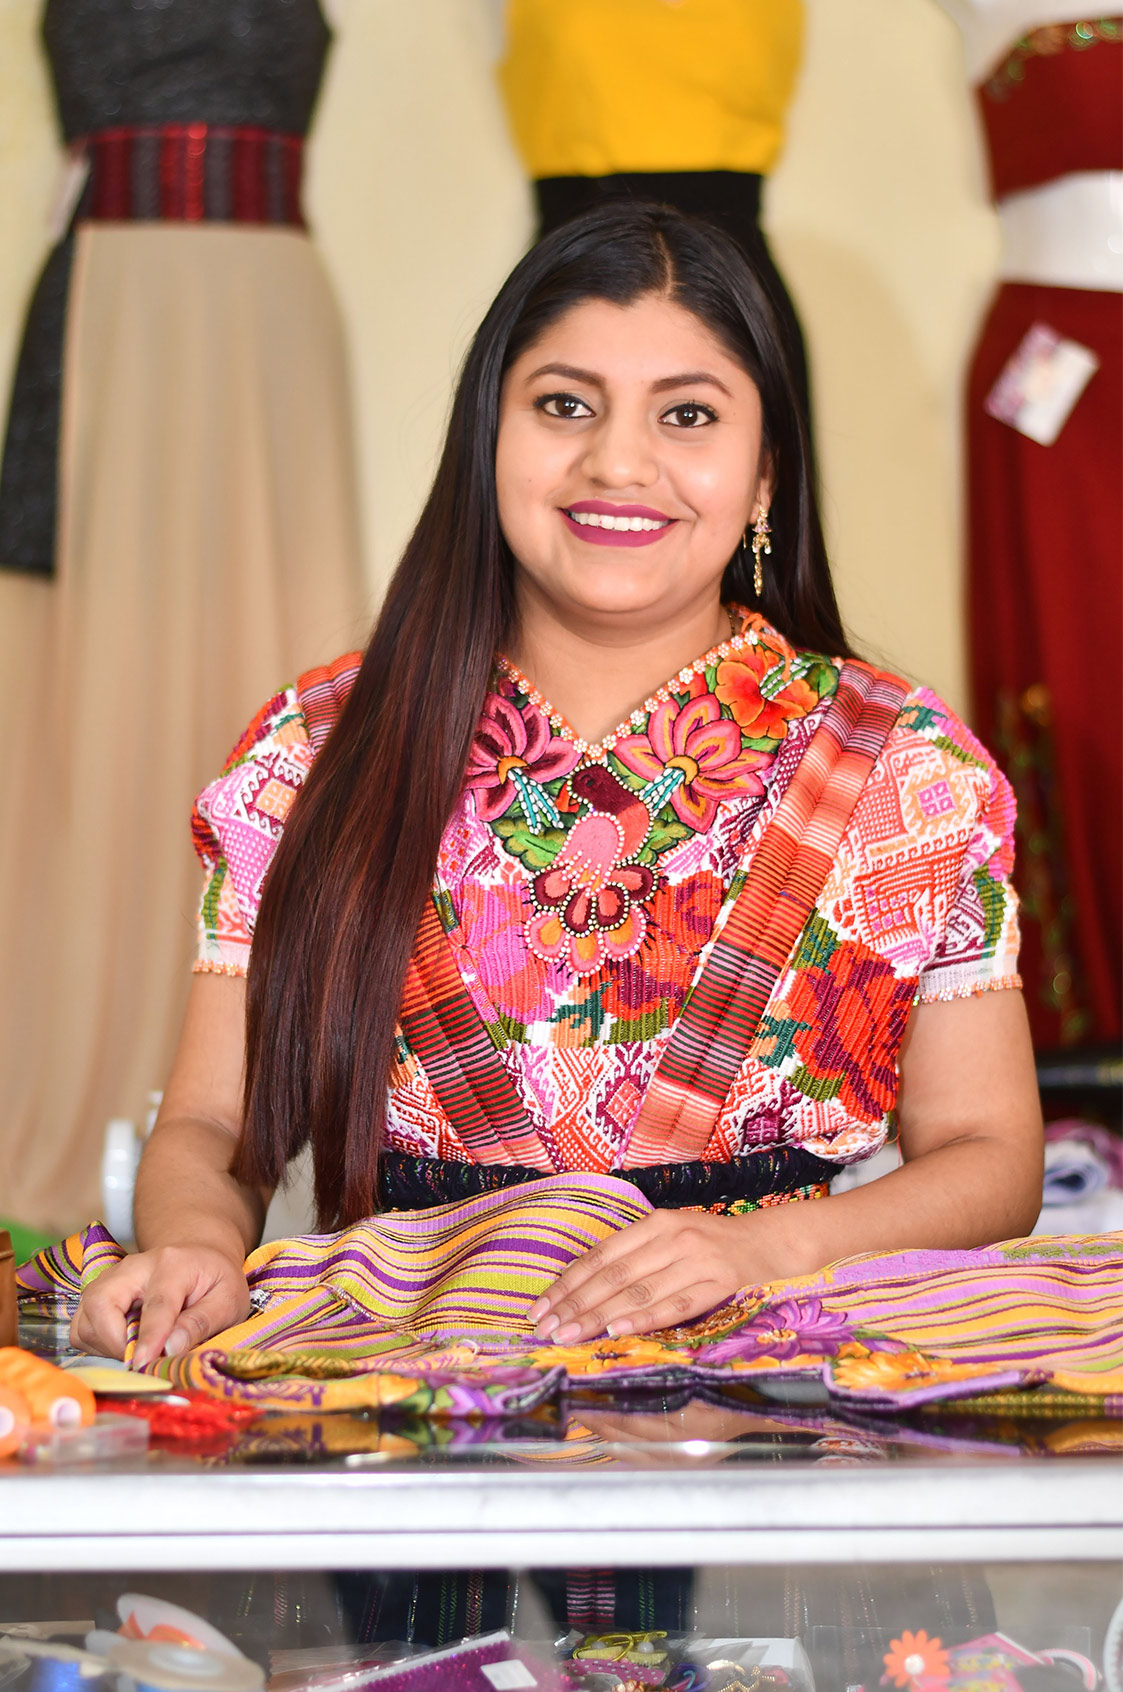 Imagen mujer guatemalteca by Calmo Agency